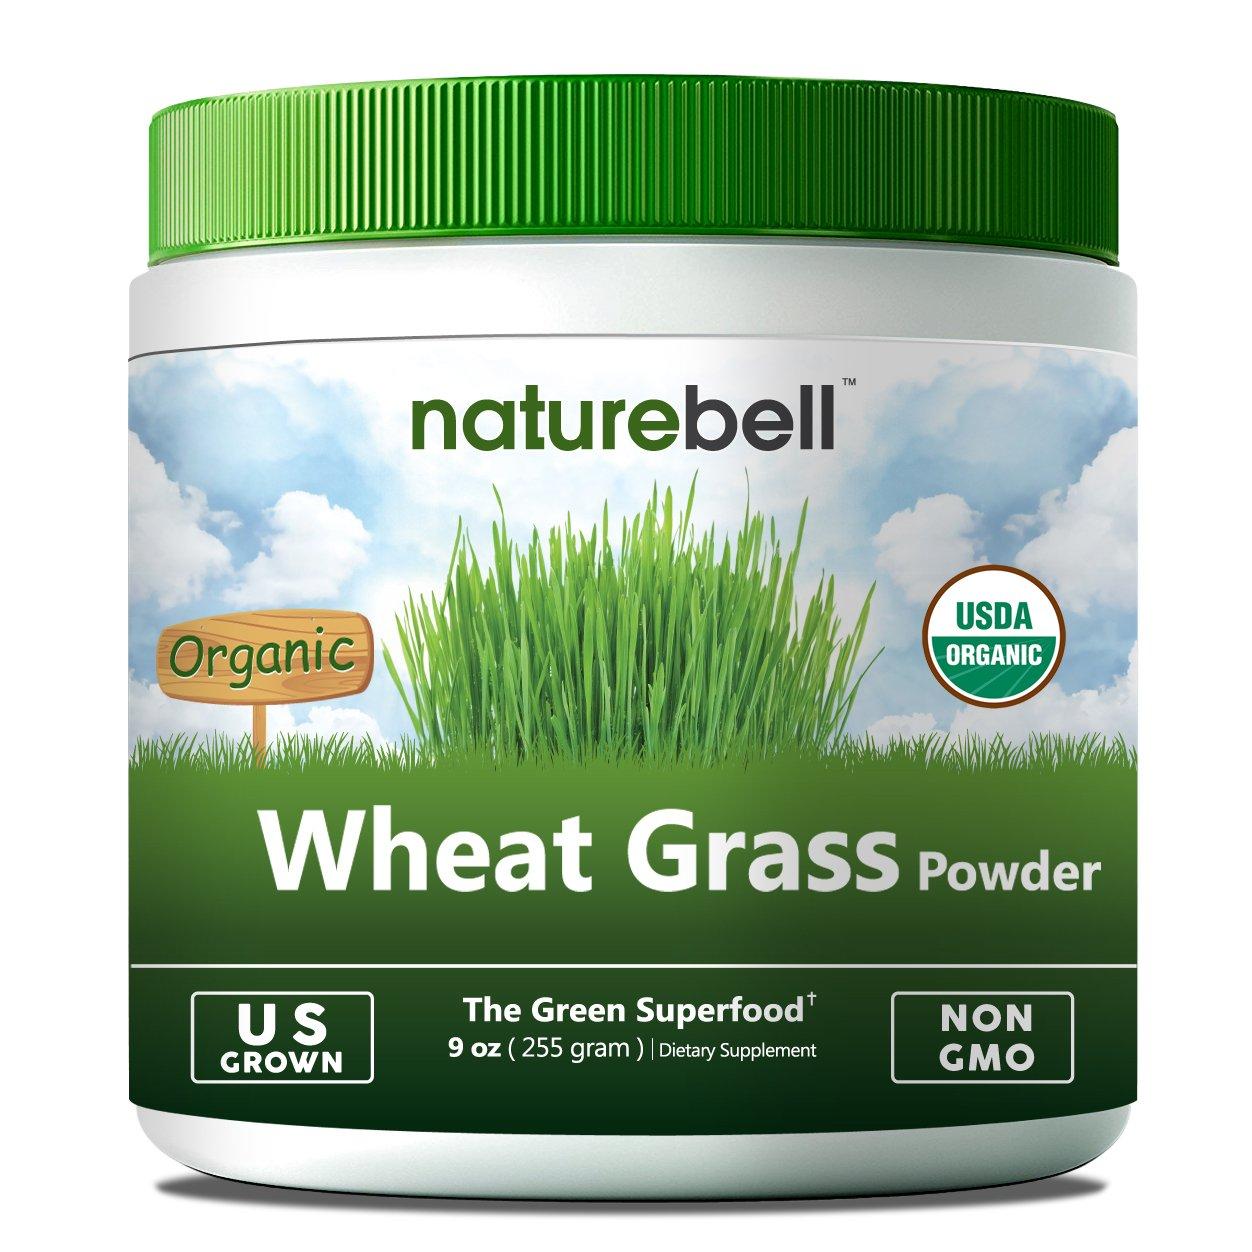 NatureBell U.S Grown Organic Wheat Grass Powder (9 oz) -85 ...